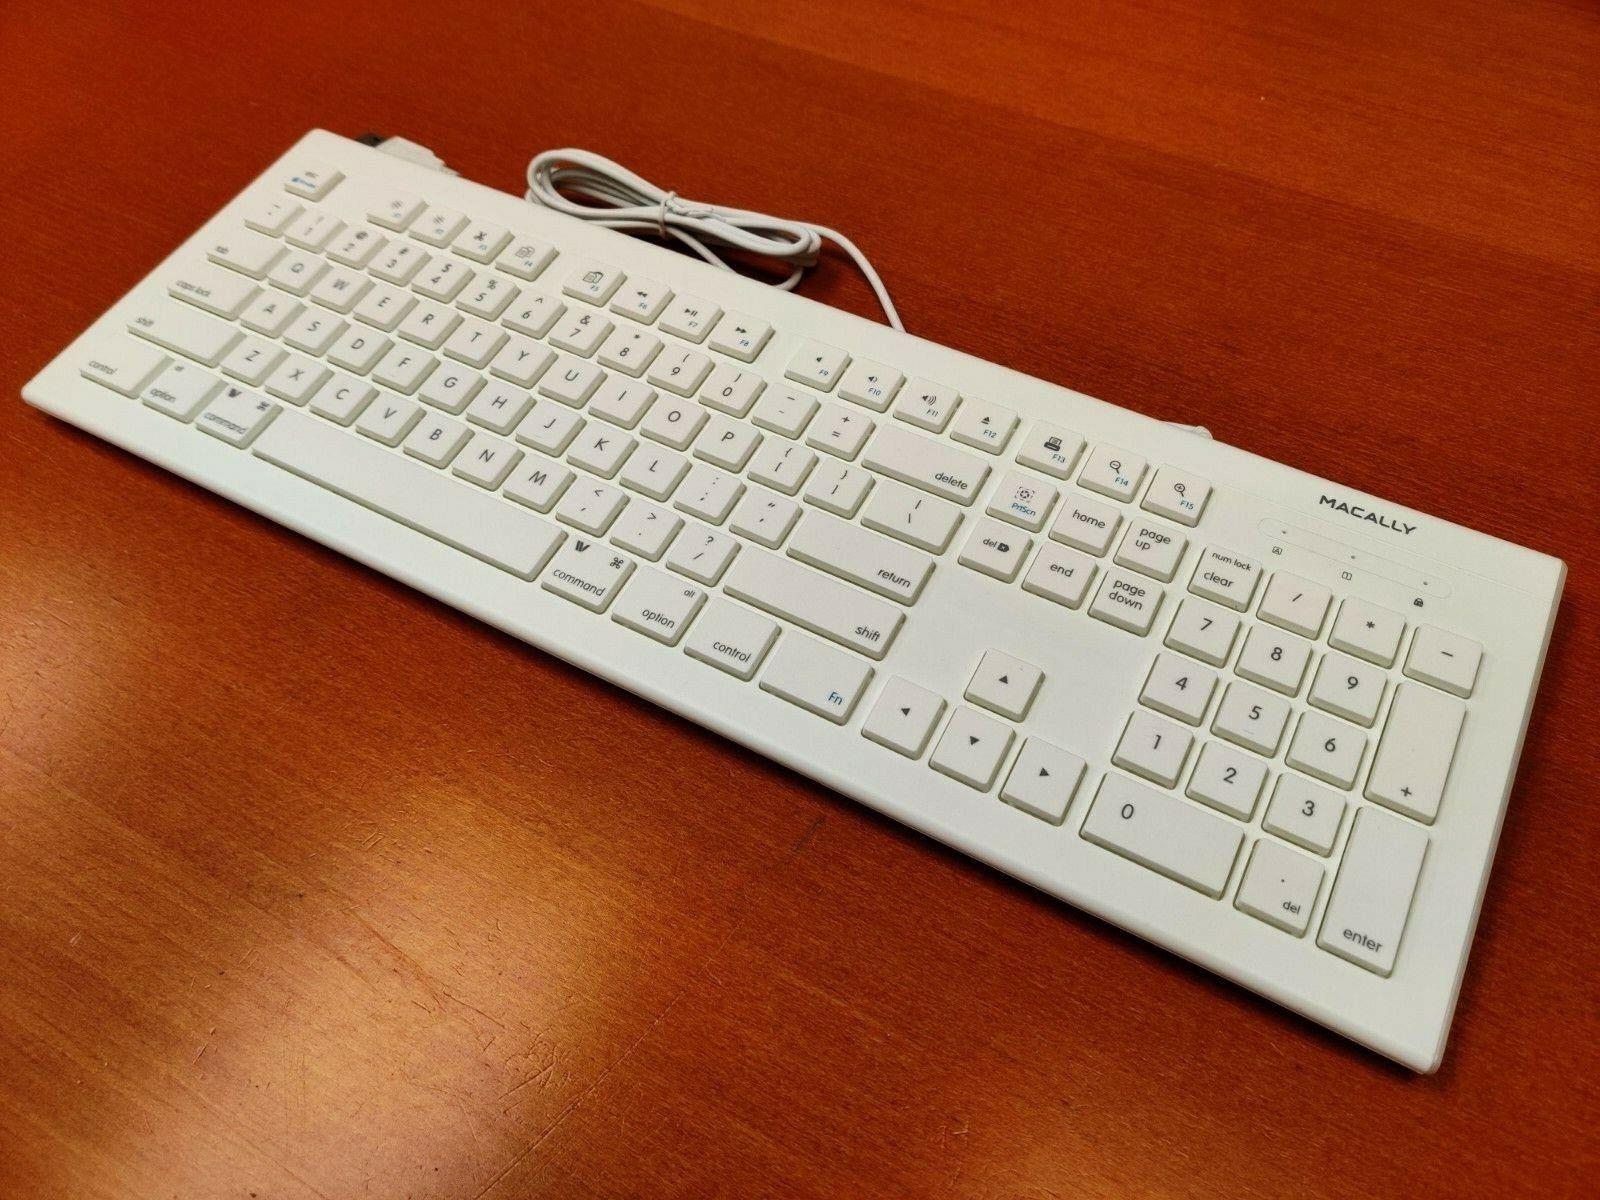 Apple Mac Keyboard - Macally 104 Key Full-Size USB Keyboard